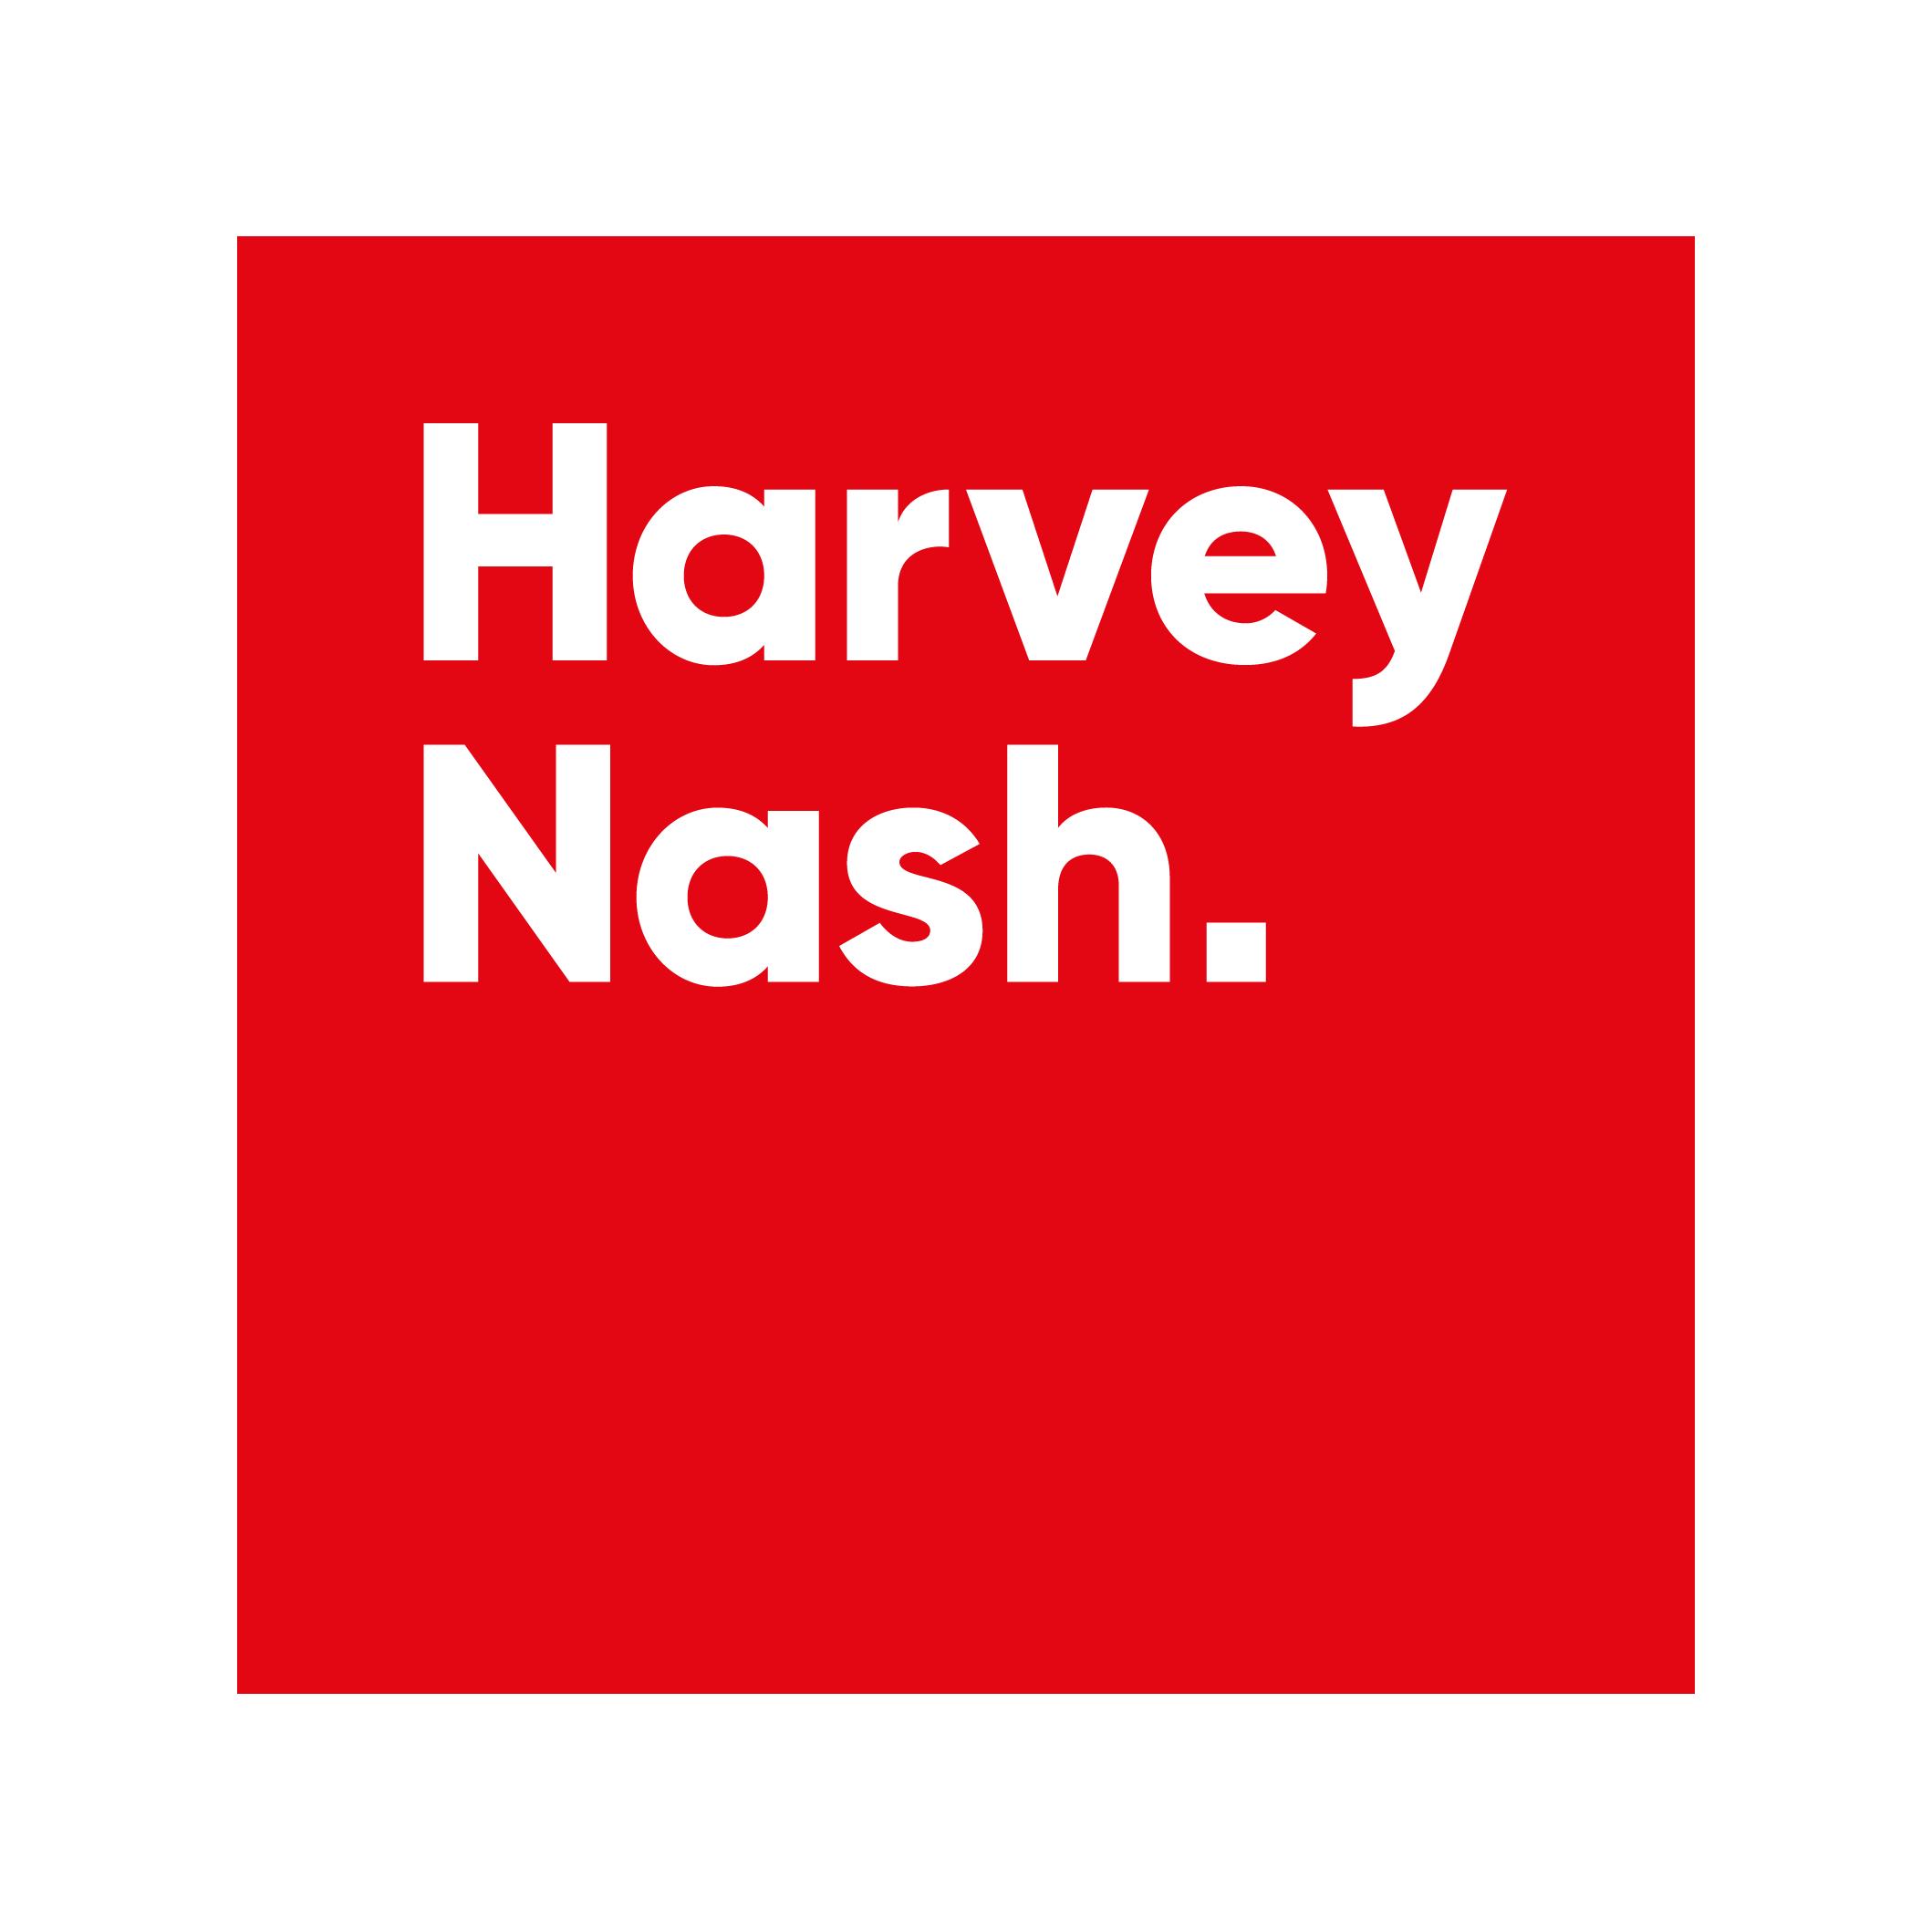 Harvey_Nash_Primary_Pos_sRGB.png